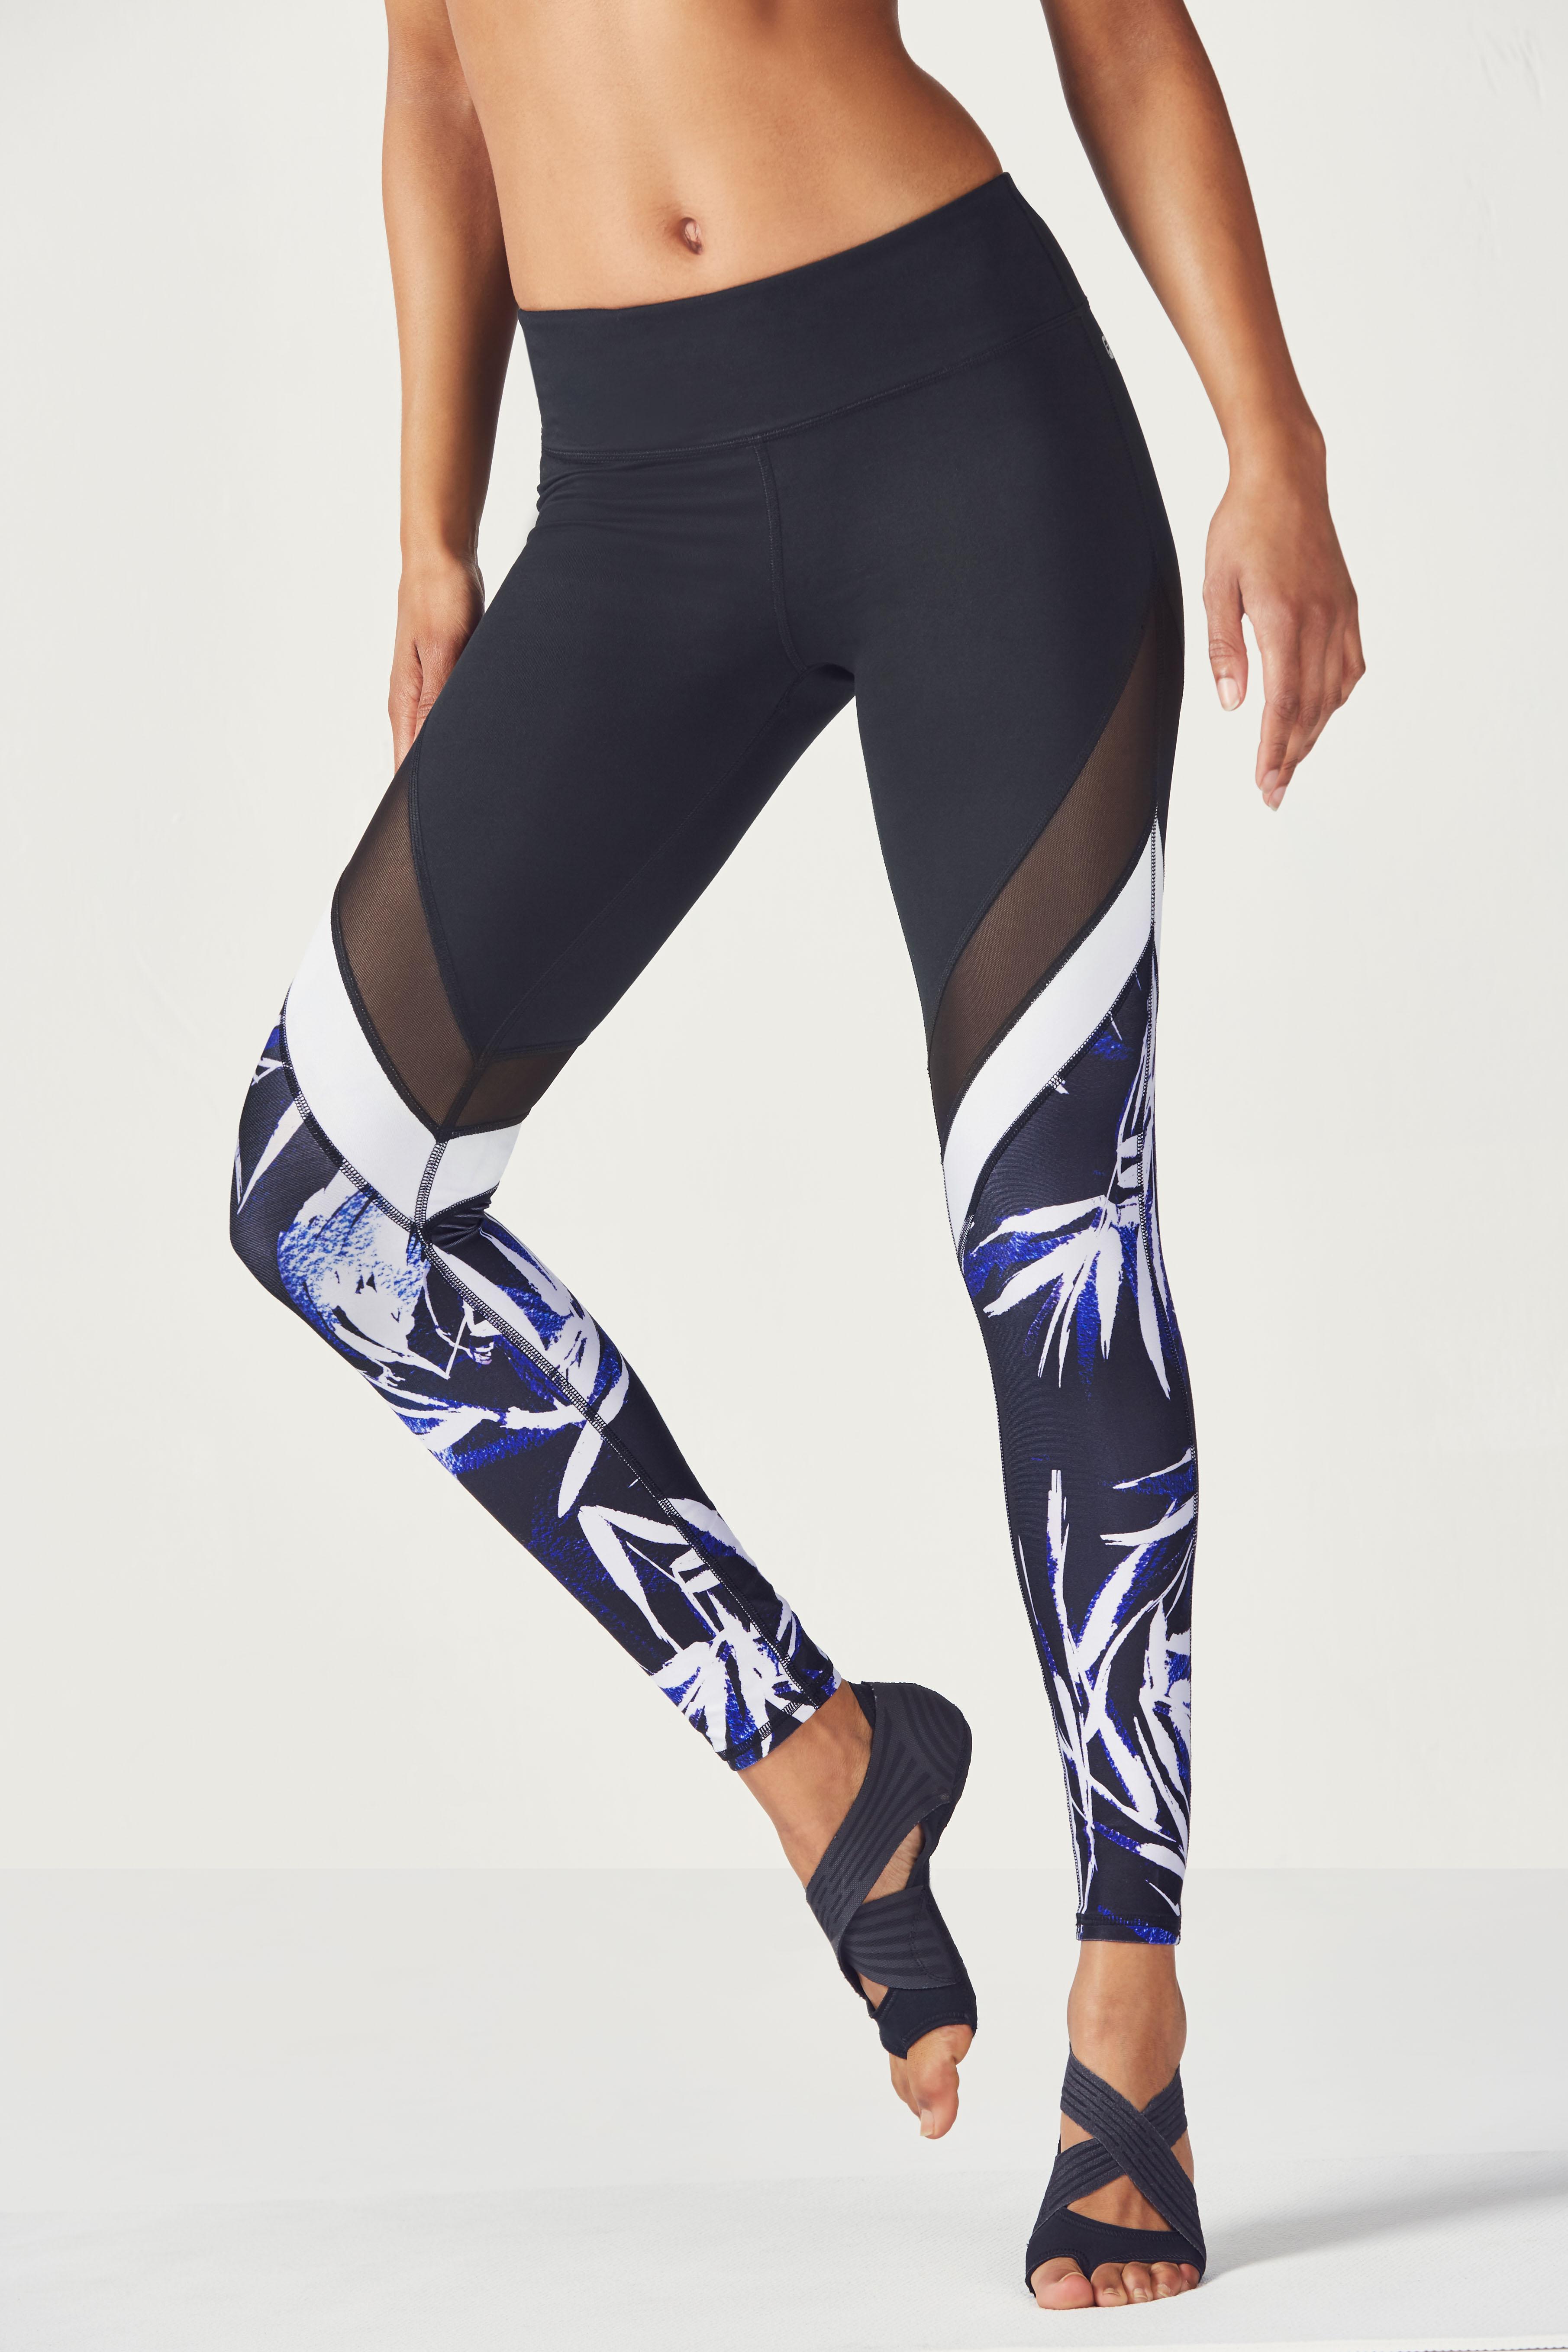 a3be44e2a40efa Salar Mesh PowerHold® Legging - Black/La Palma Print/White